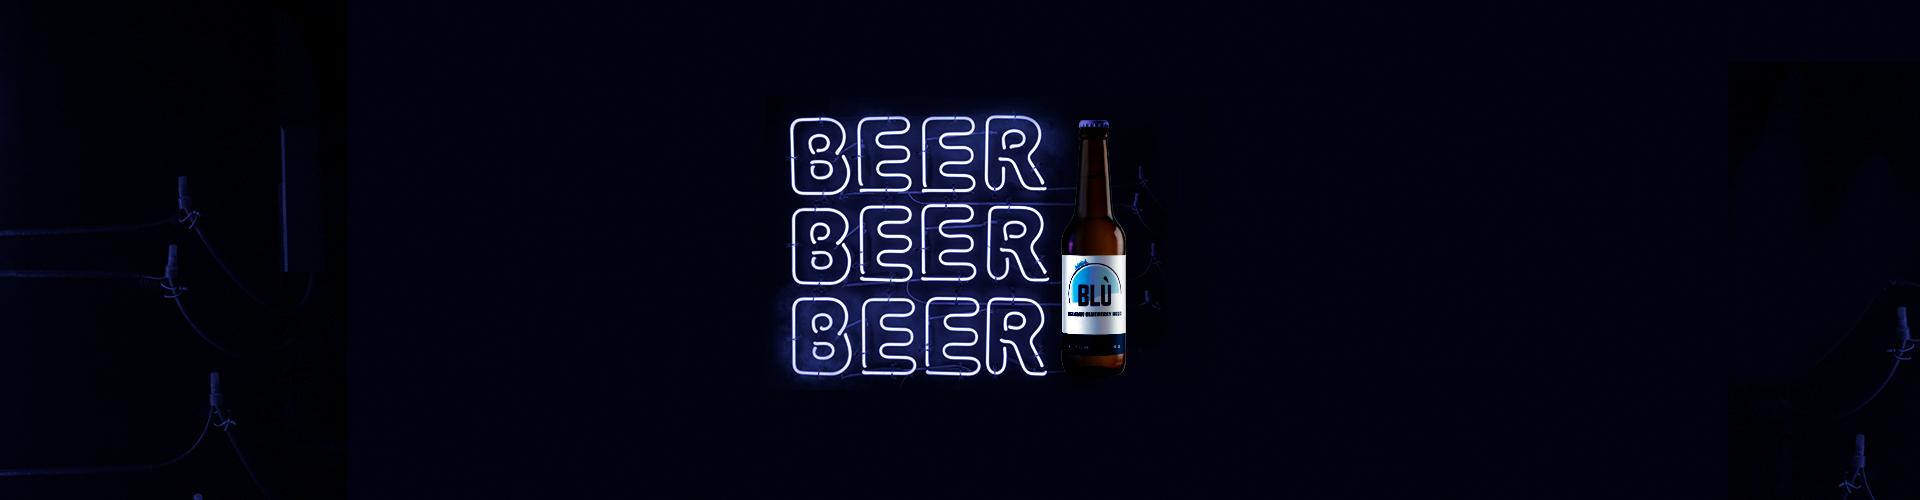 Blù - Blueberry beer